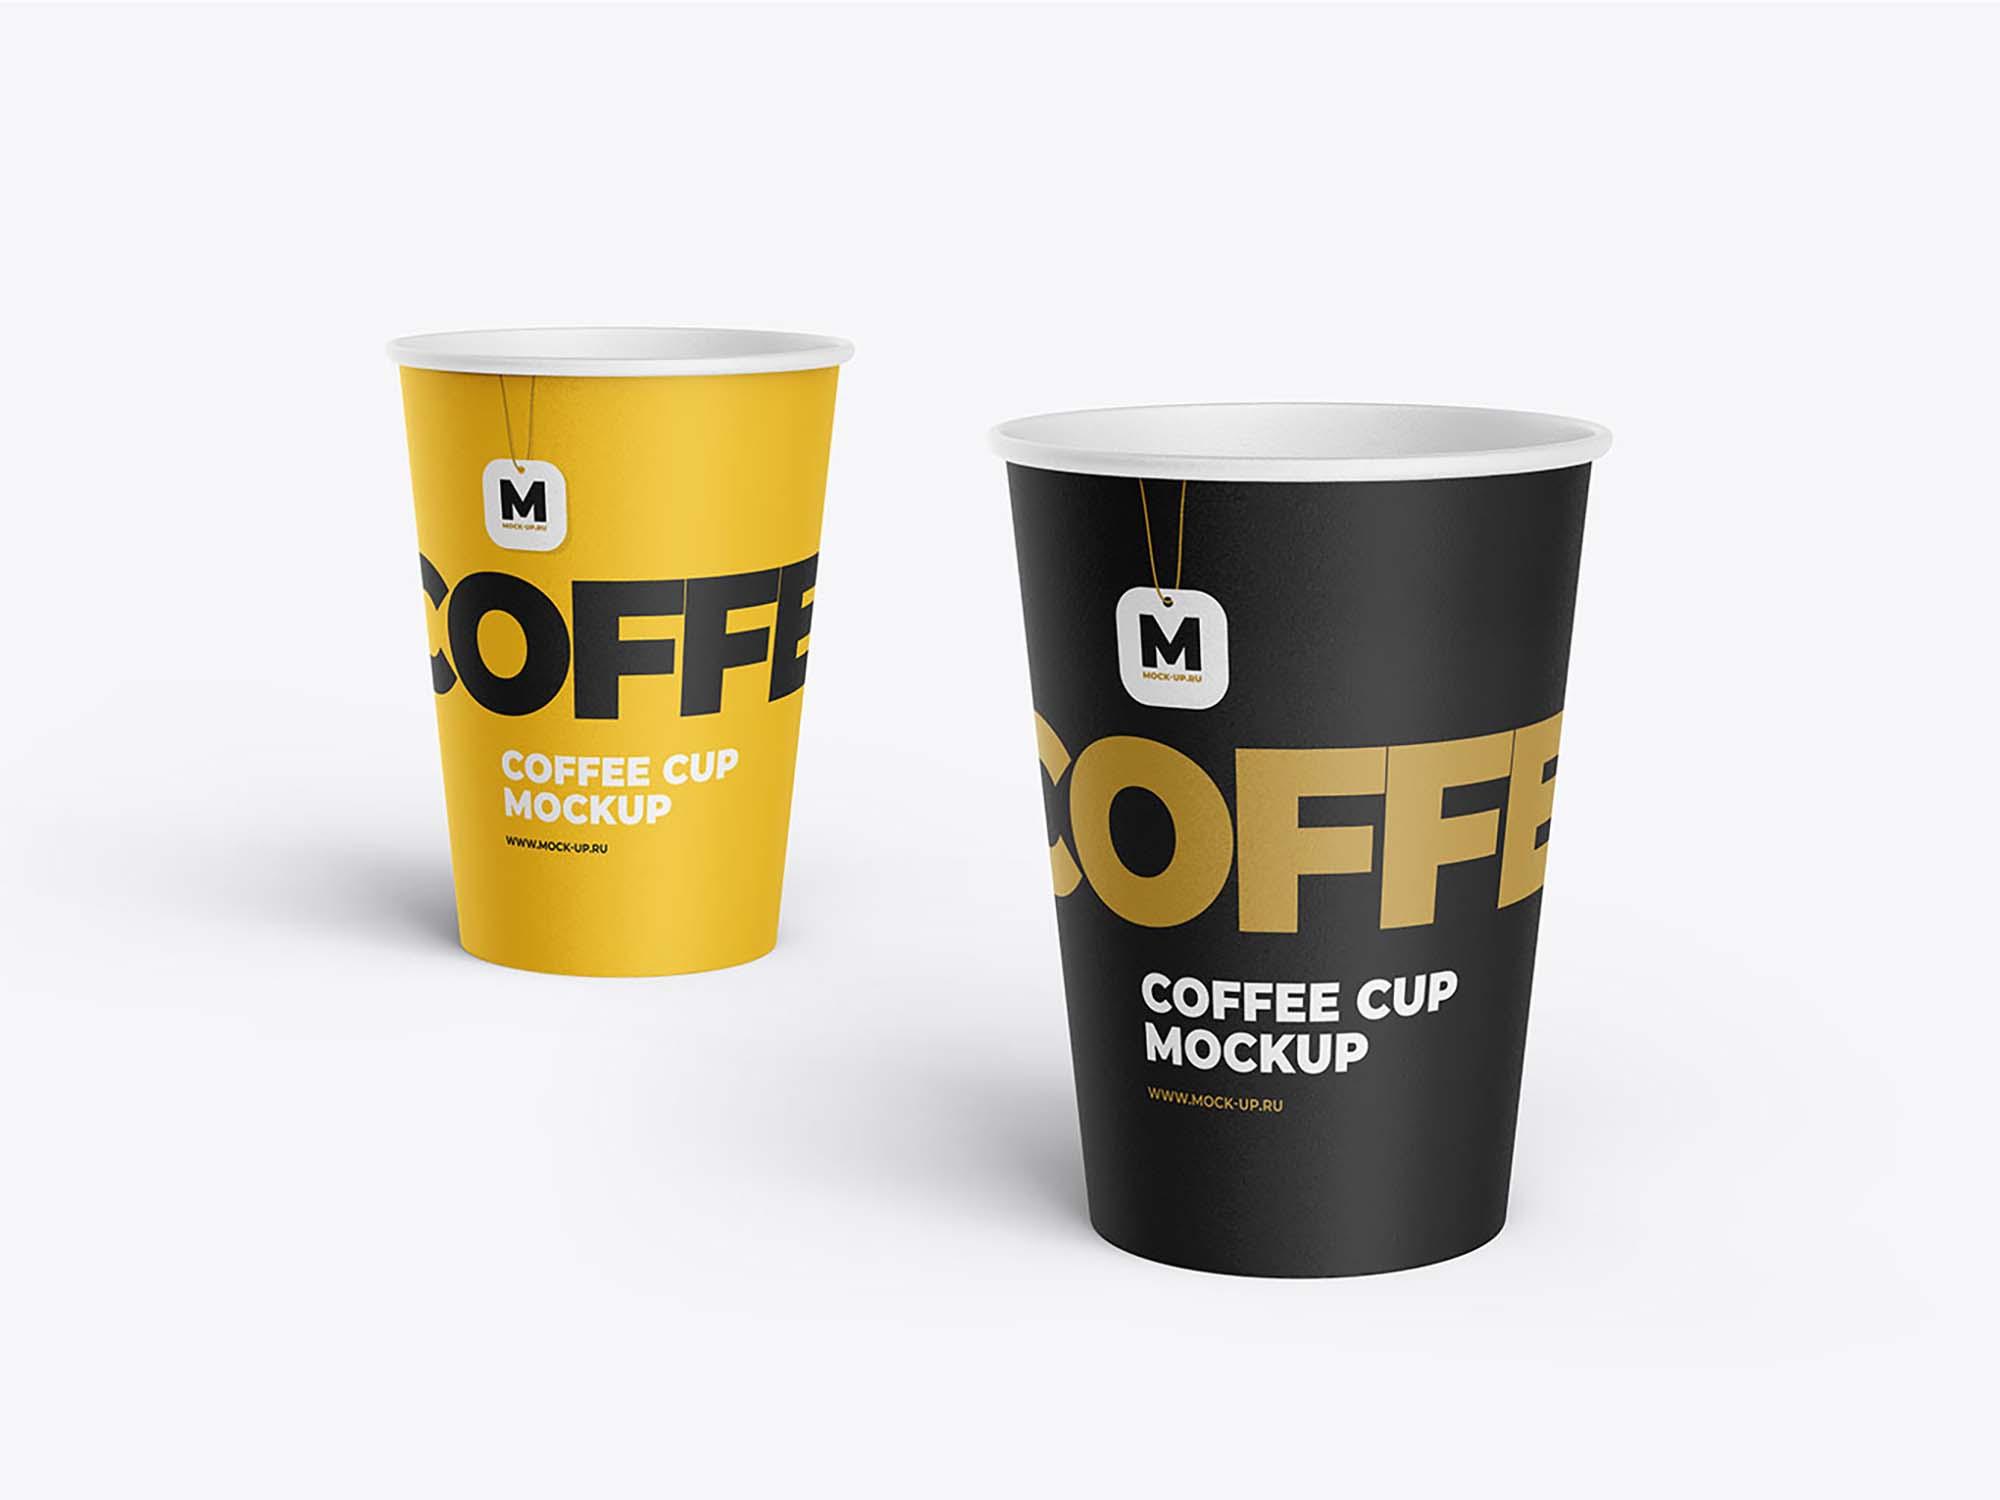 Tea and Coffee Cup Mockup 3